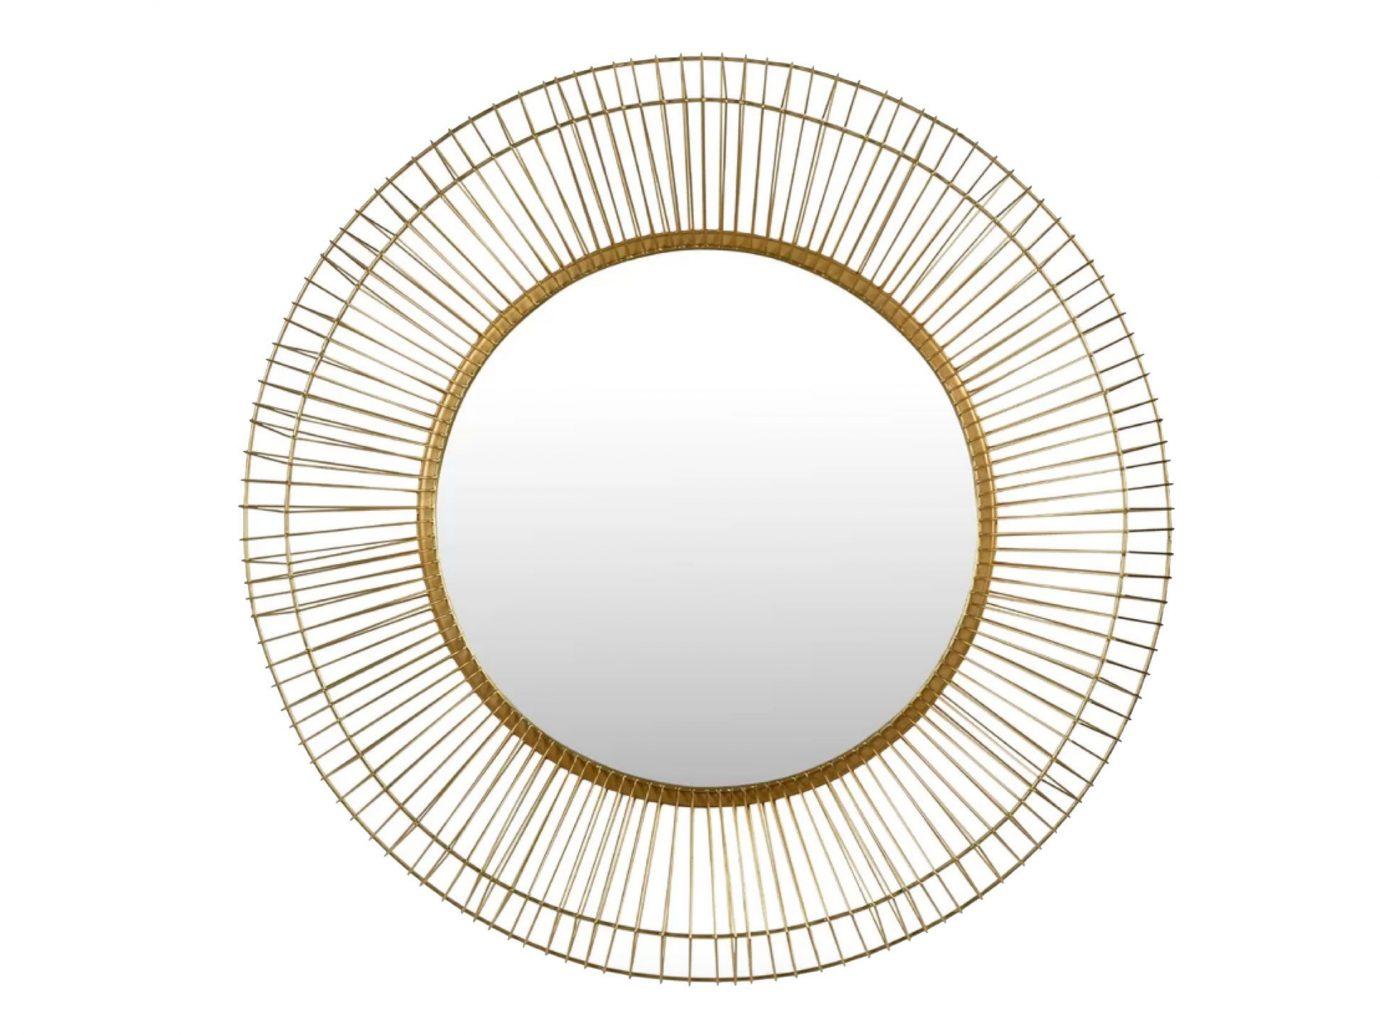 City Copenhagen Kyoto Marrakech Palm Springs Style + Design Travel Shop Tulum circle line product design oval device fan silhouette